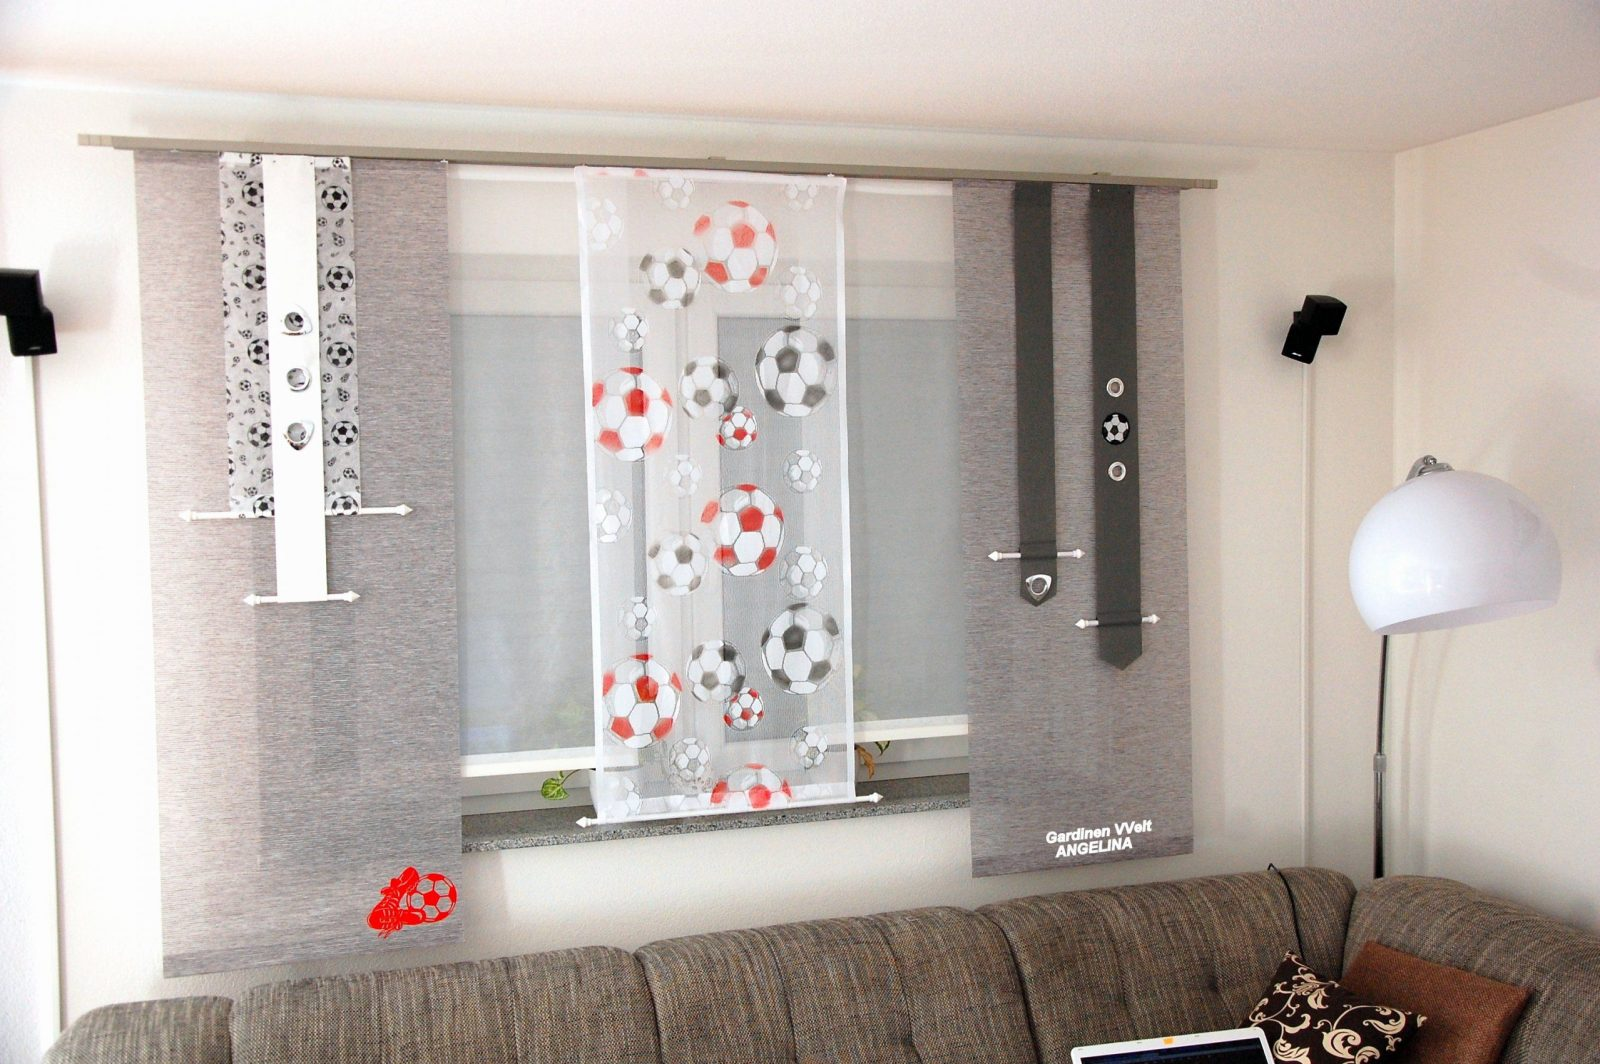 vorhang selbst gestalten cool dekoria with vorhang selbst gestalten beautiful heutzutage. Black Bedroom Furniture Sets. Home Design Ideas